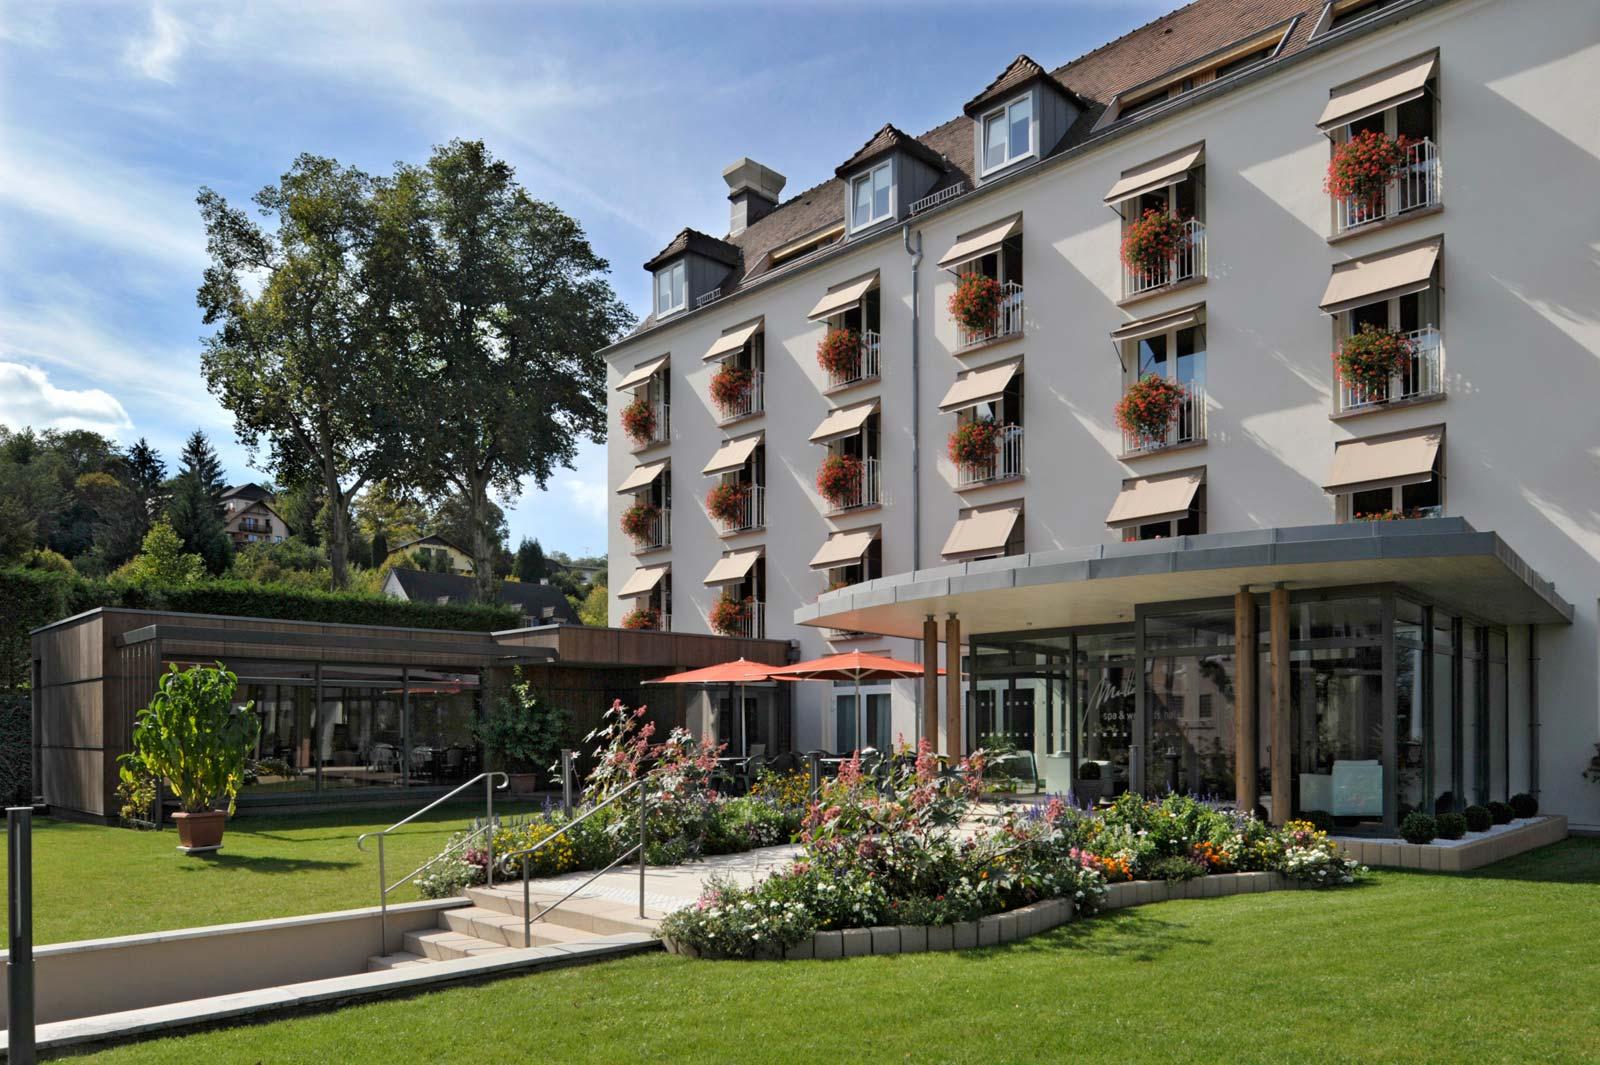 Hôtel Muller, Niederbronn-les-Bains, Alsace